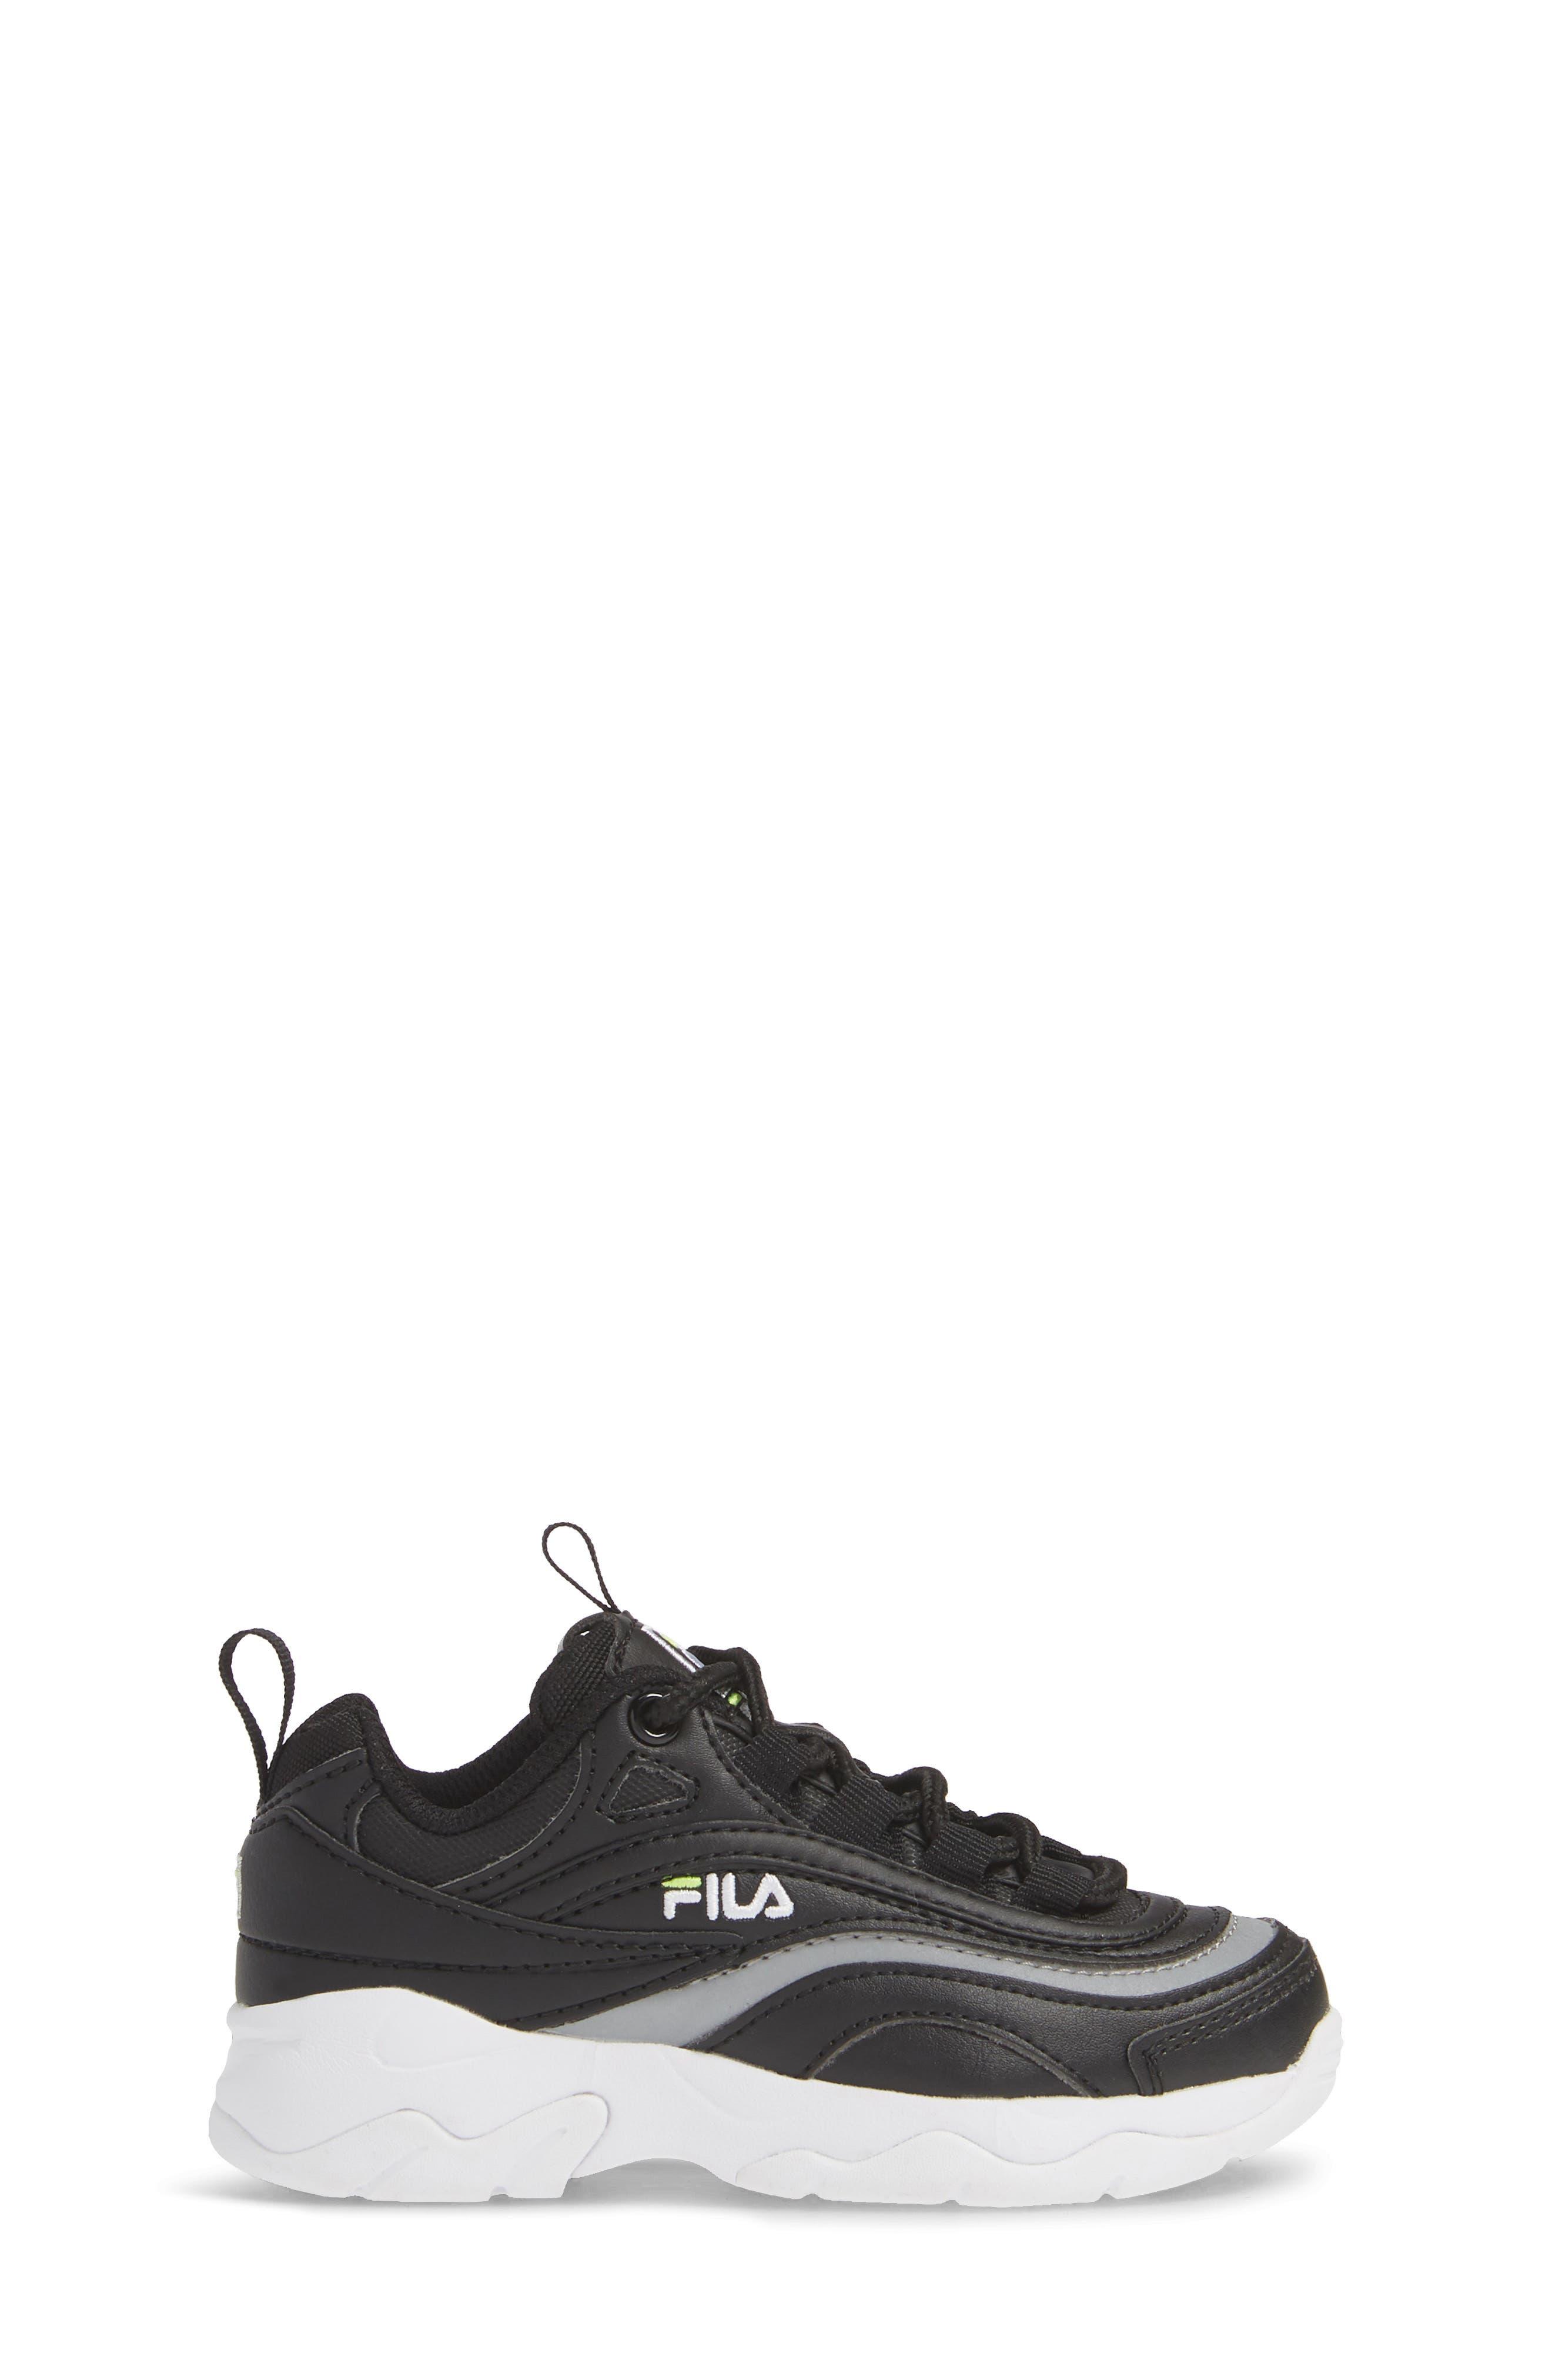 FILA,                             Ray Sneaker,                             Alternate thumbnail 3, color,                             BLACK/ SAFETY YELLOW/ SILVER